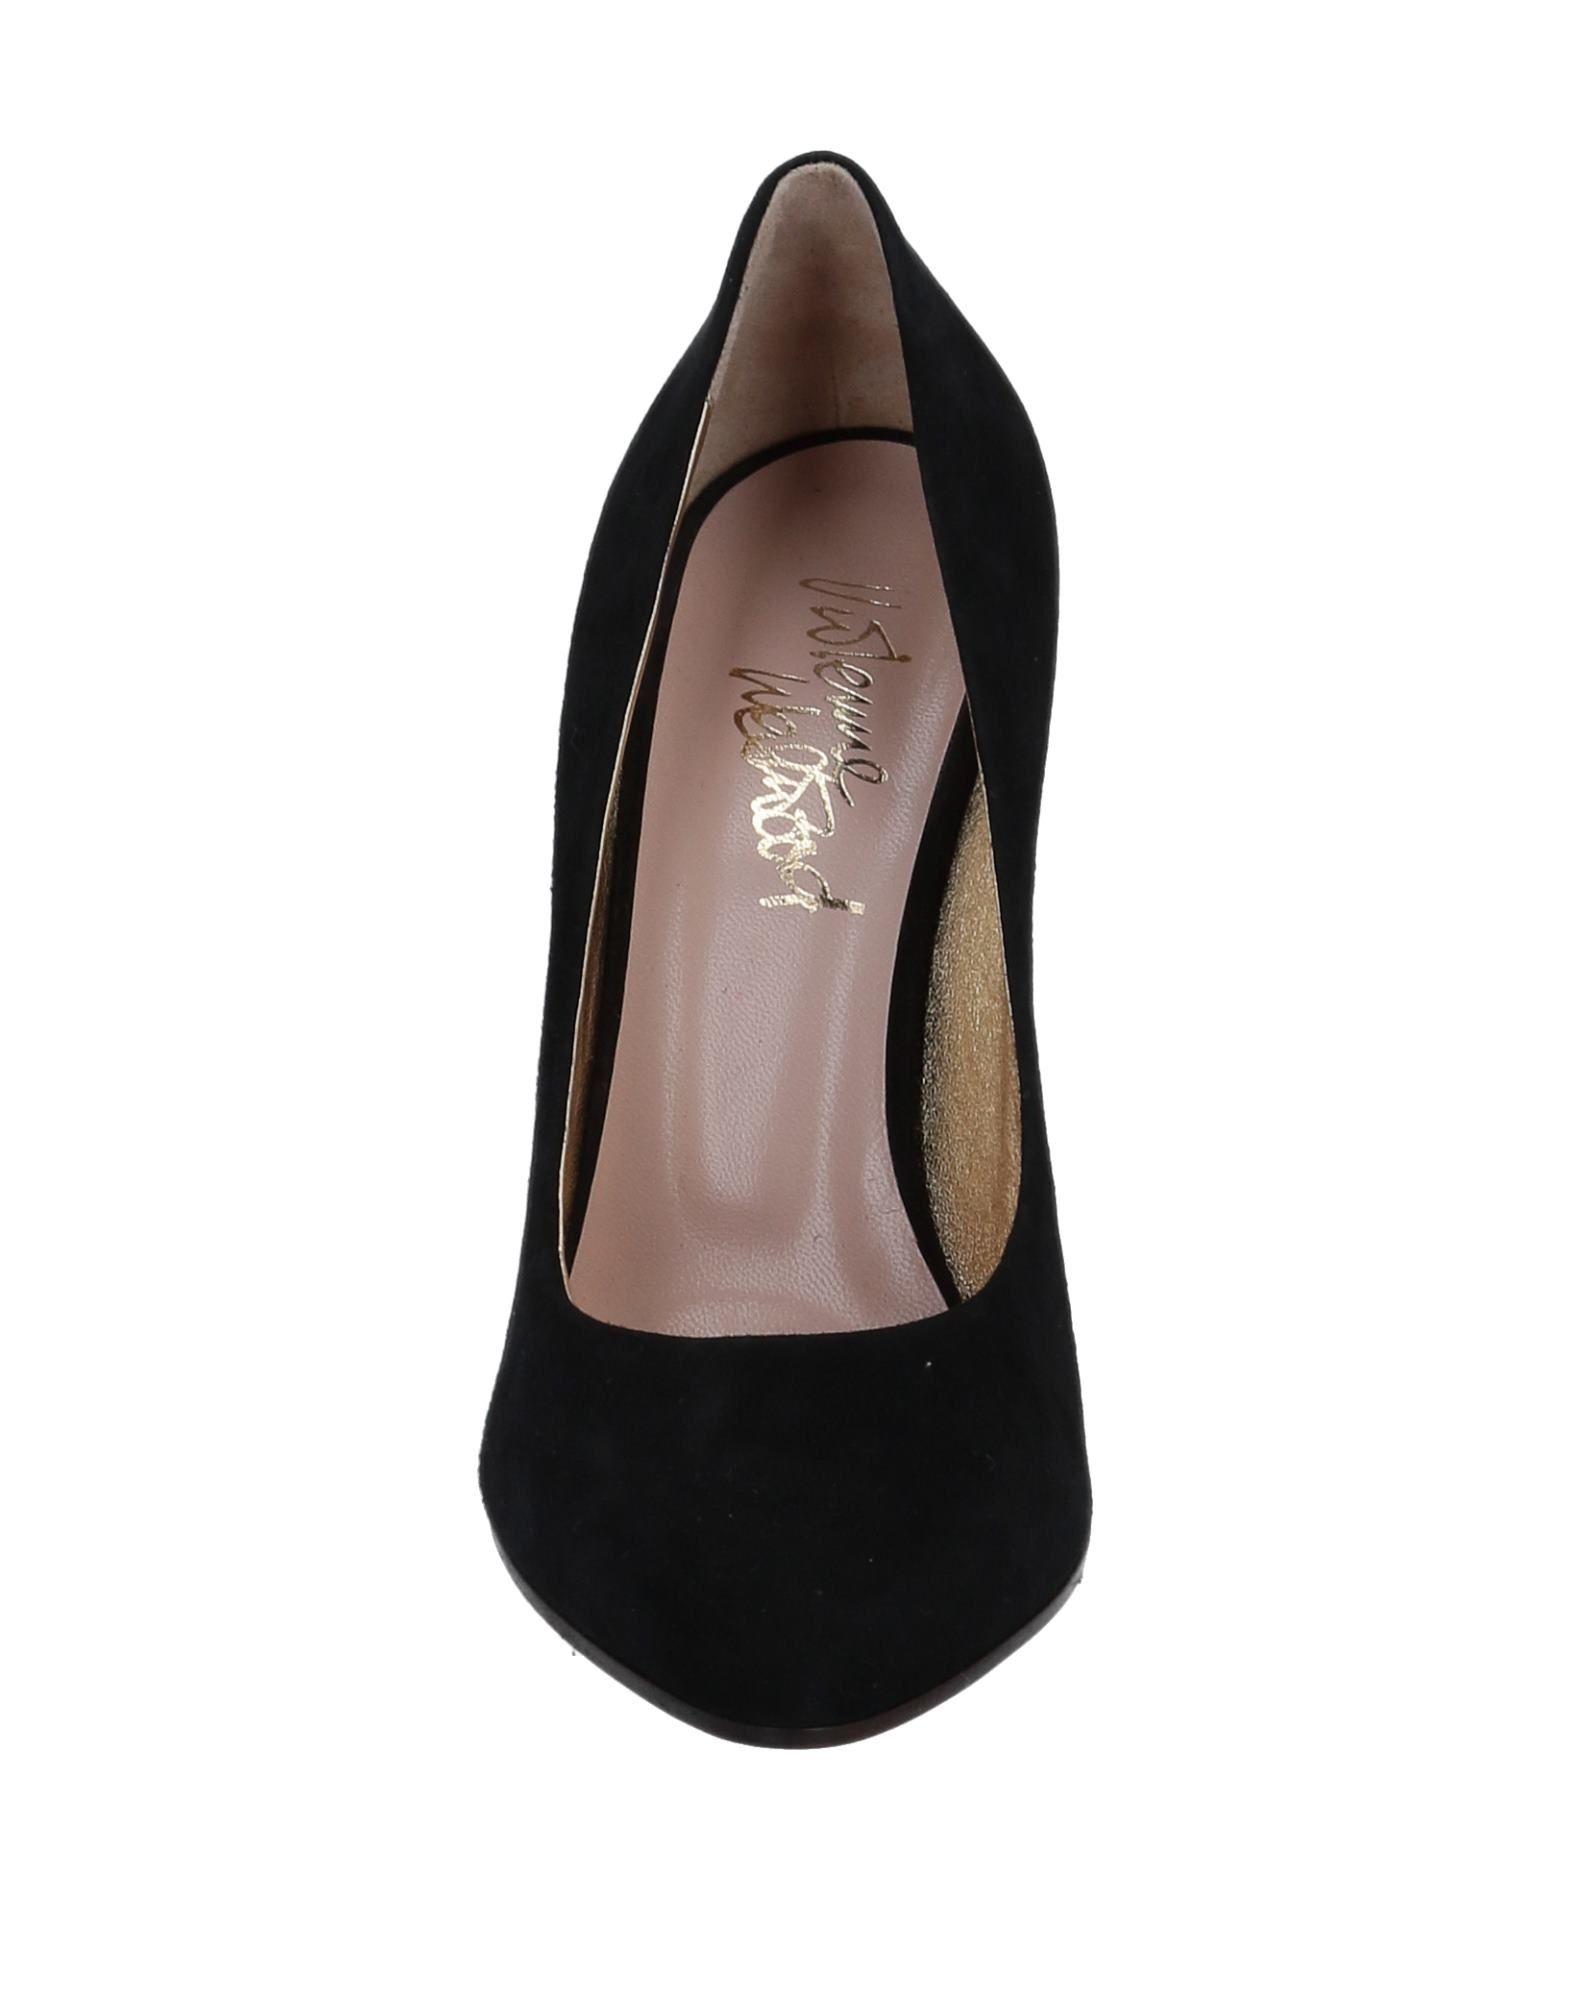 Rabatt Schuhe Vivienne Westwood Pumps Damen  11517380AS